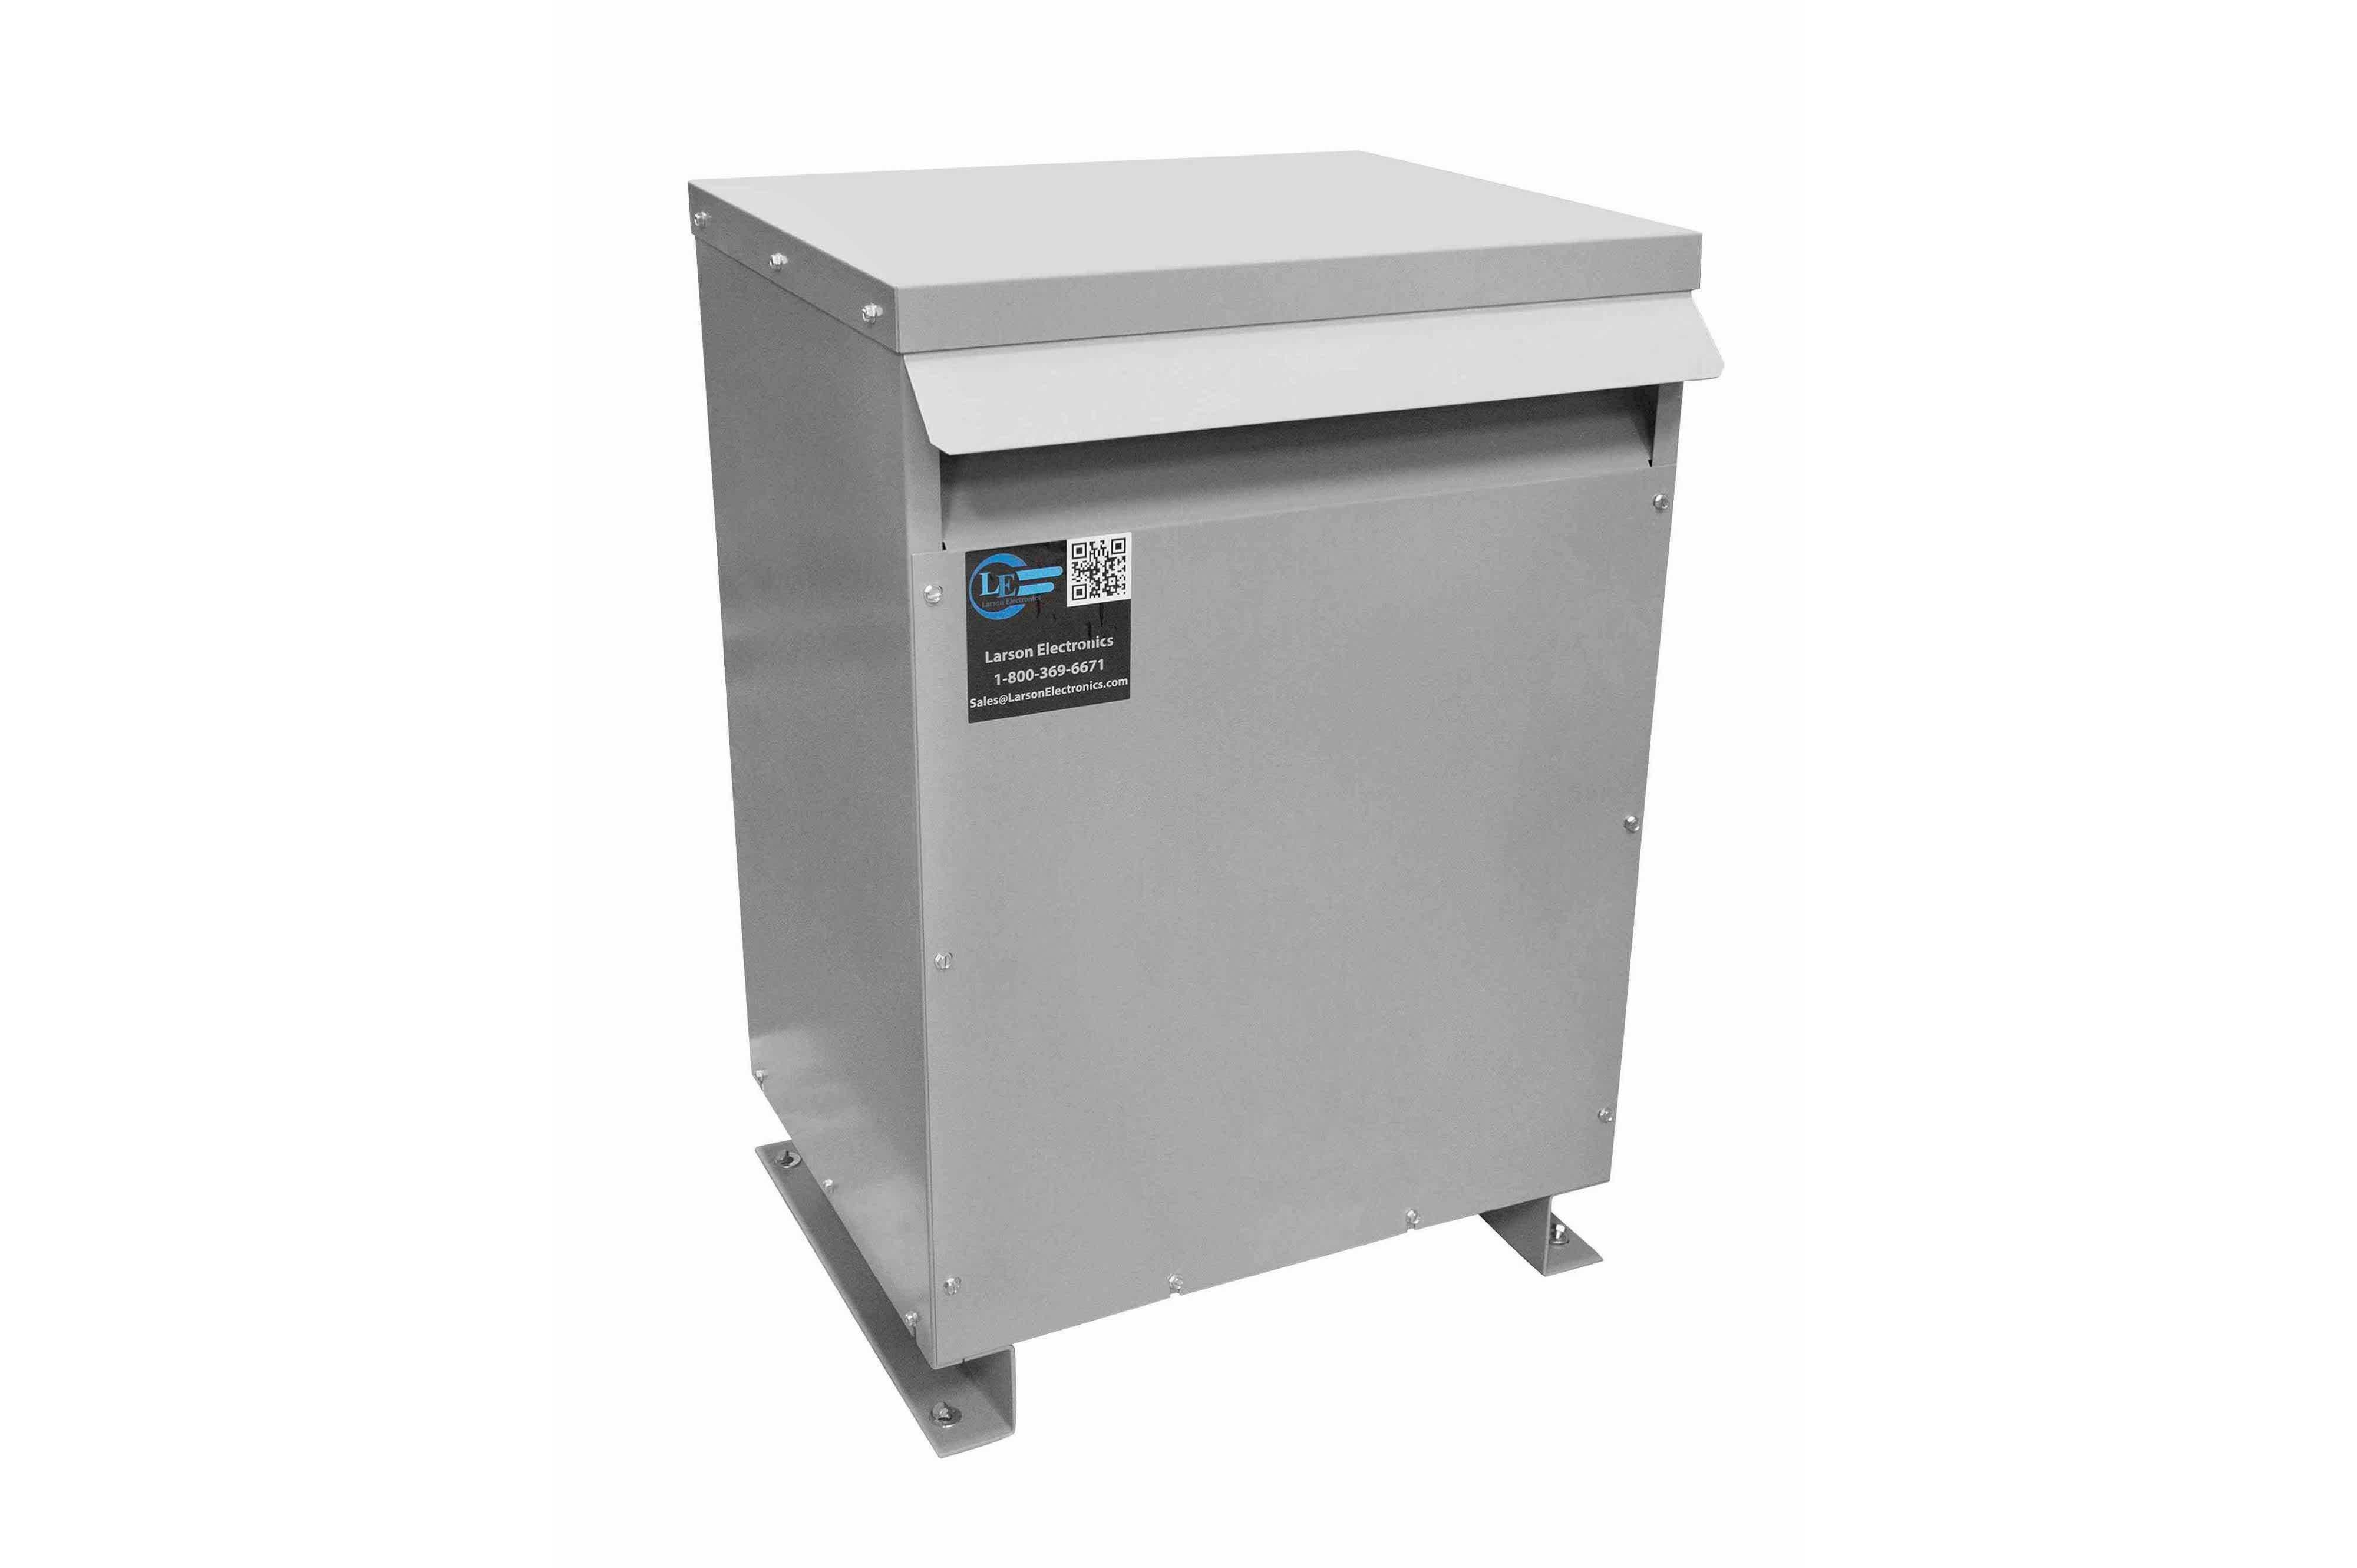 50 kVA 3PH Isolation Transformer, 600V Wye Primary, 240V/120 Delta Secondary, N3R, Ventilated, 60 Hz